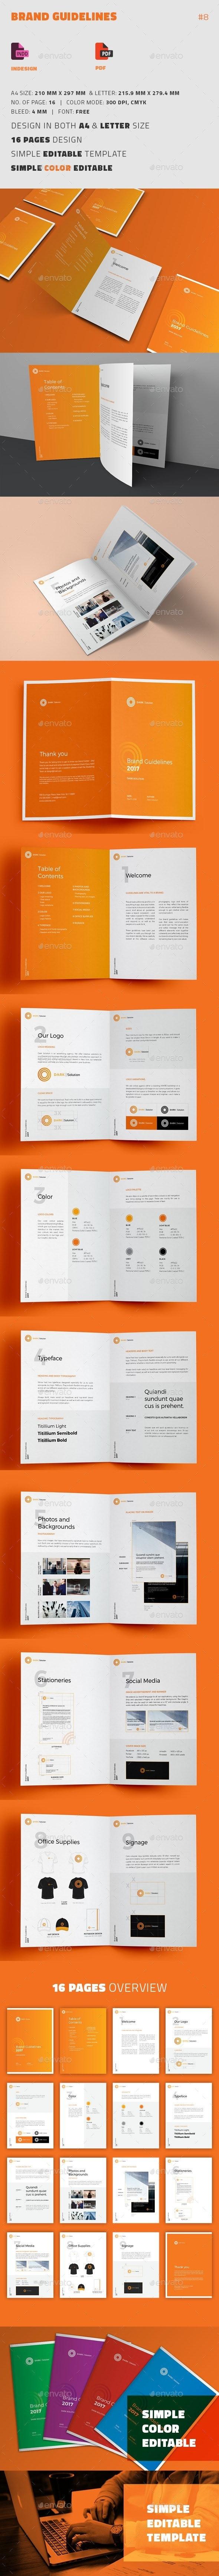 Brand Guidelines - Informational Brochures